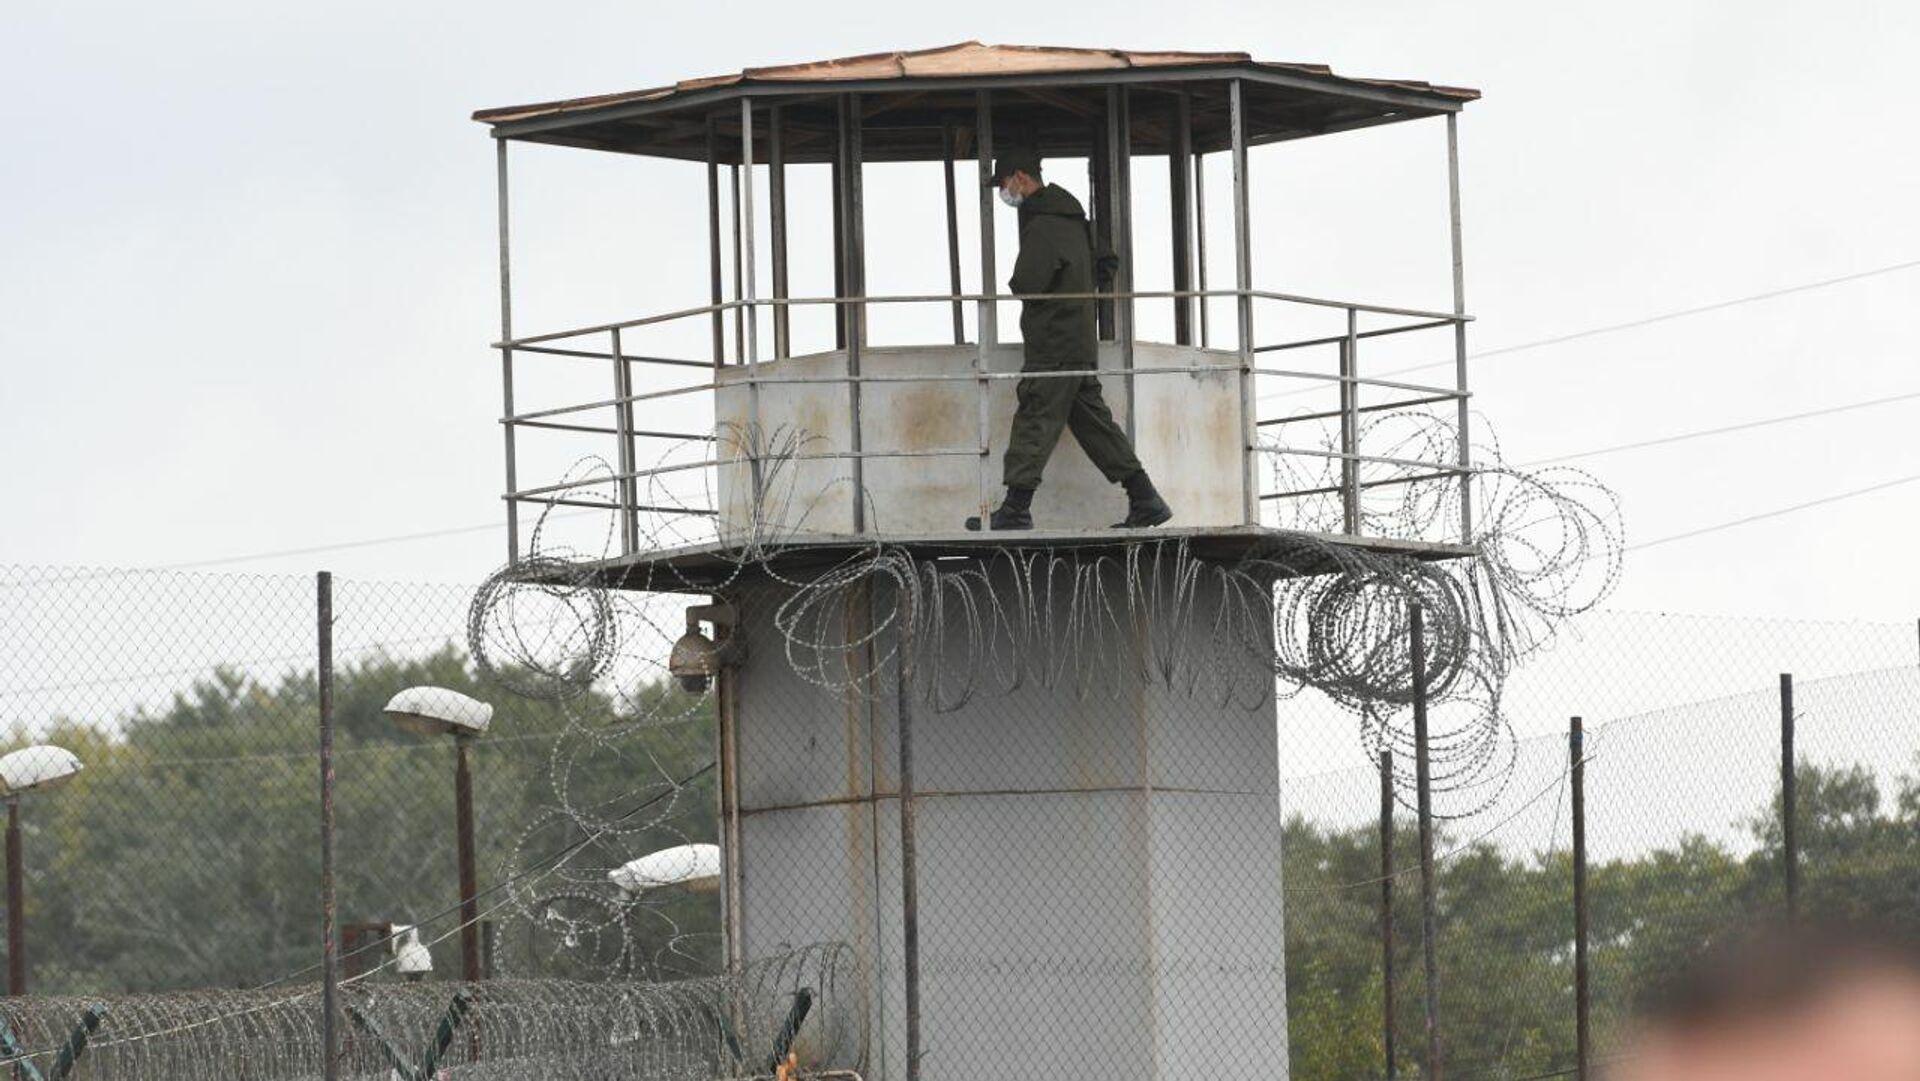 Руставская тюрьма. Вышка охраны  - Sputnik Грузия, 1920, 04.10.2021